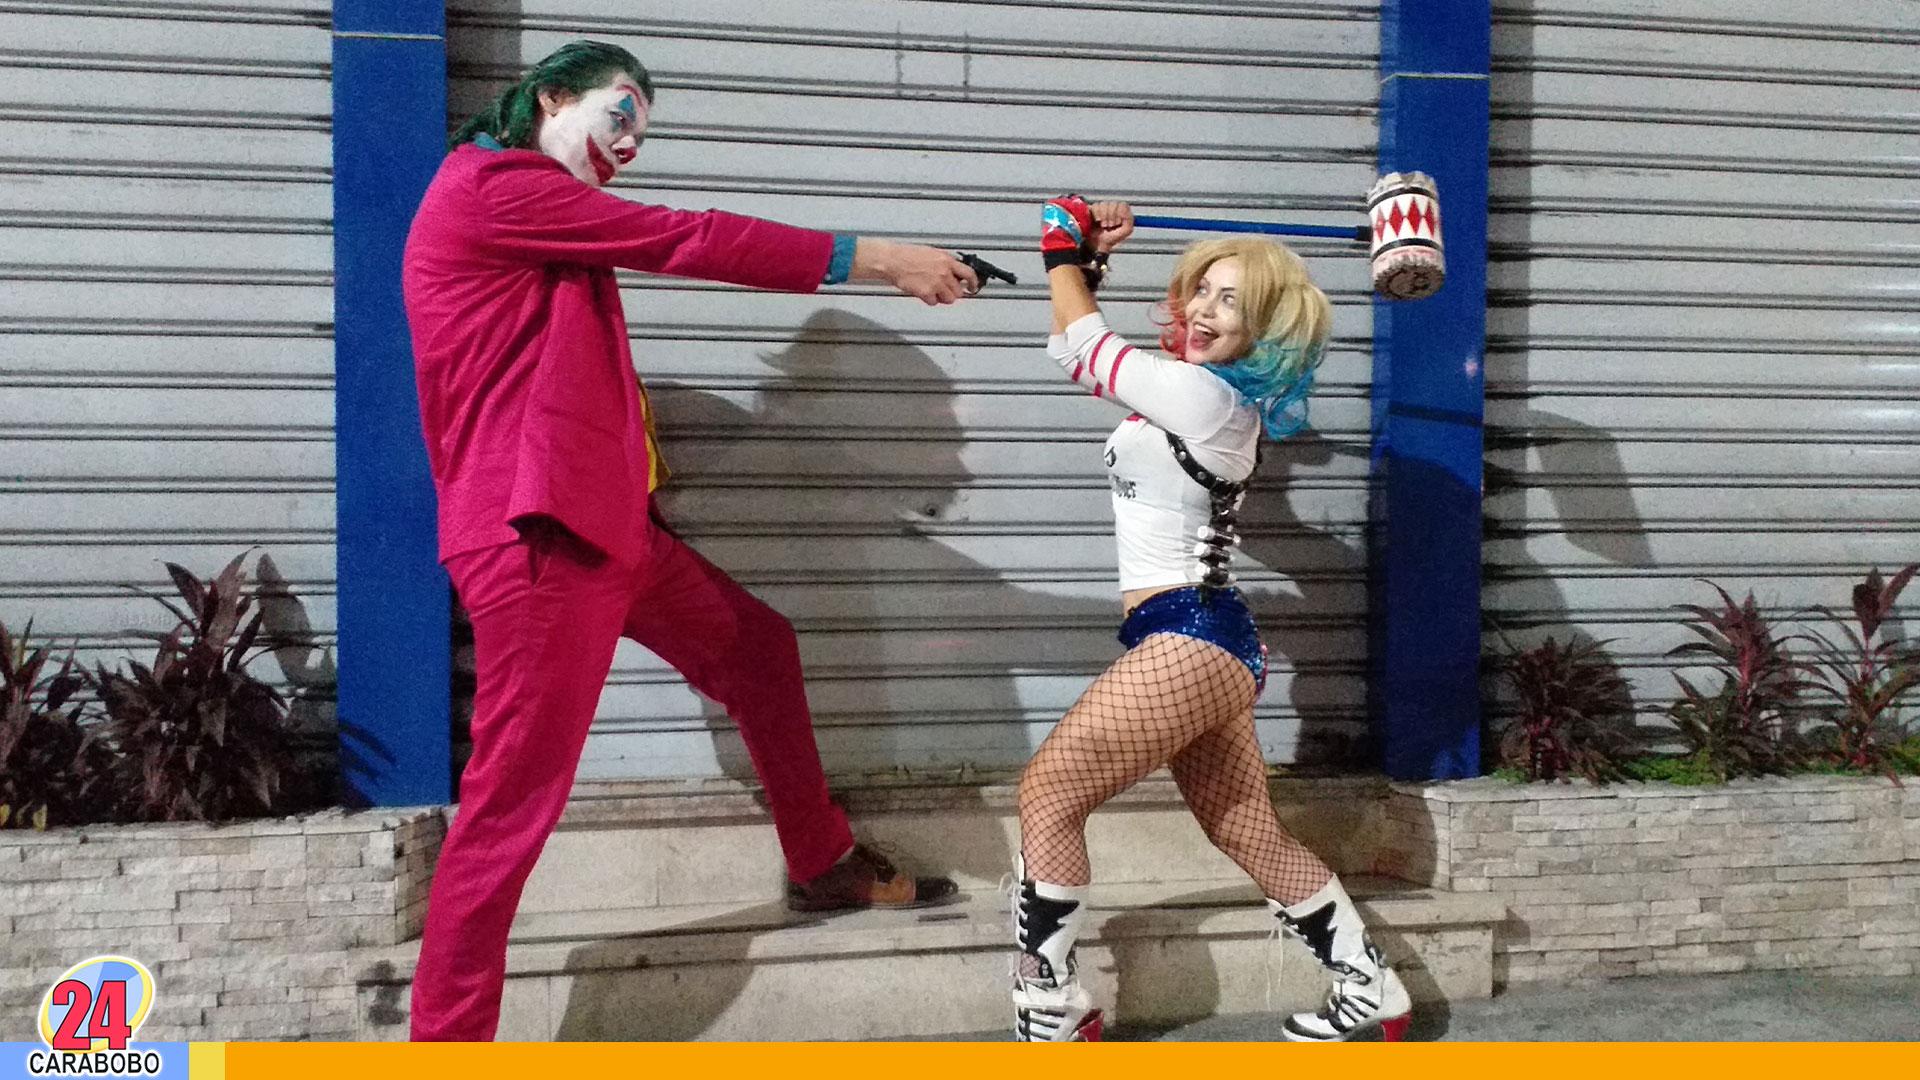 Doble del Joker - Doble del Joker